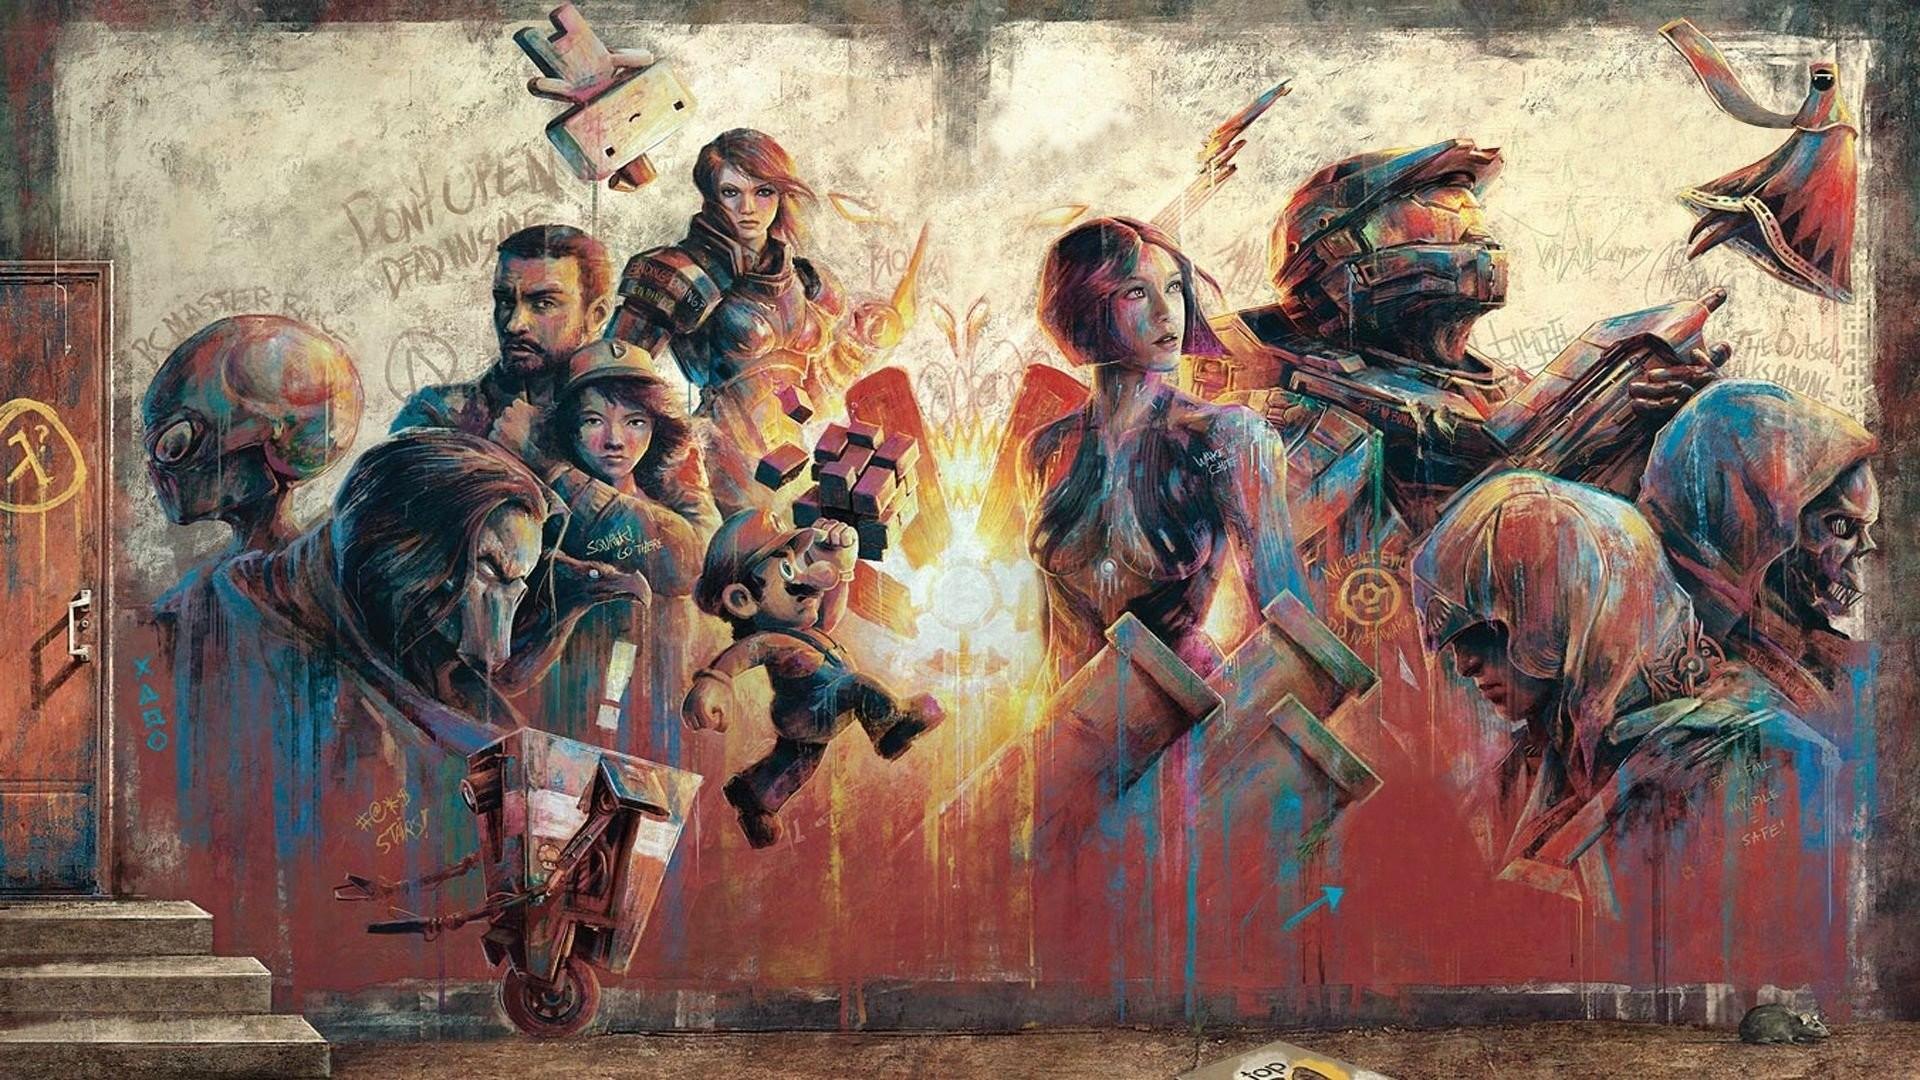 video game mashup wallpapers – photo #27. Assassins Creed Borderlands  Borderlands 2 Claptrap Co